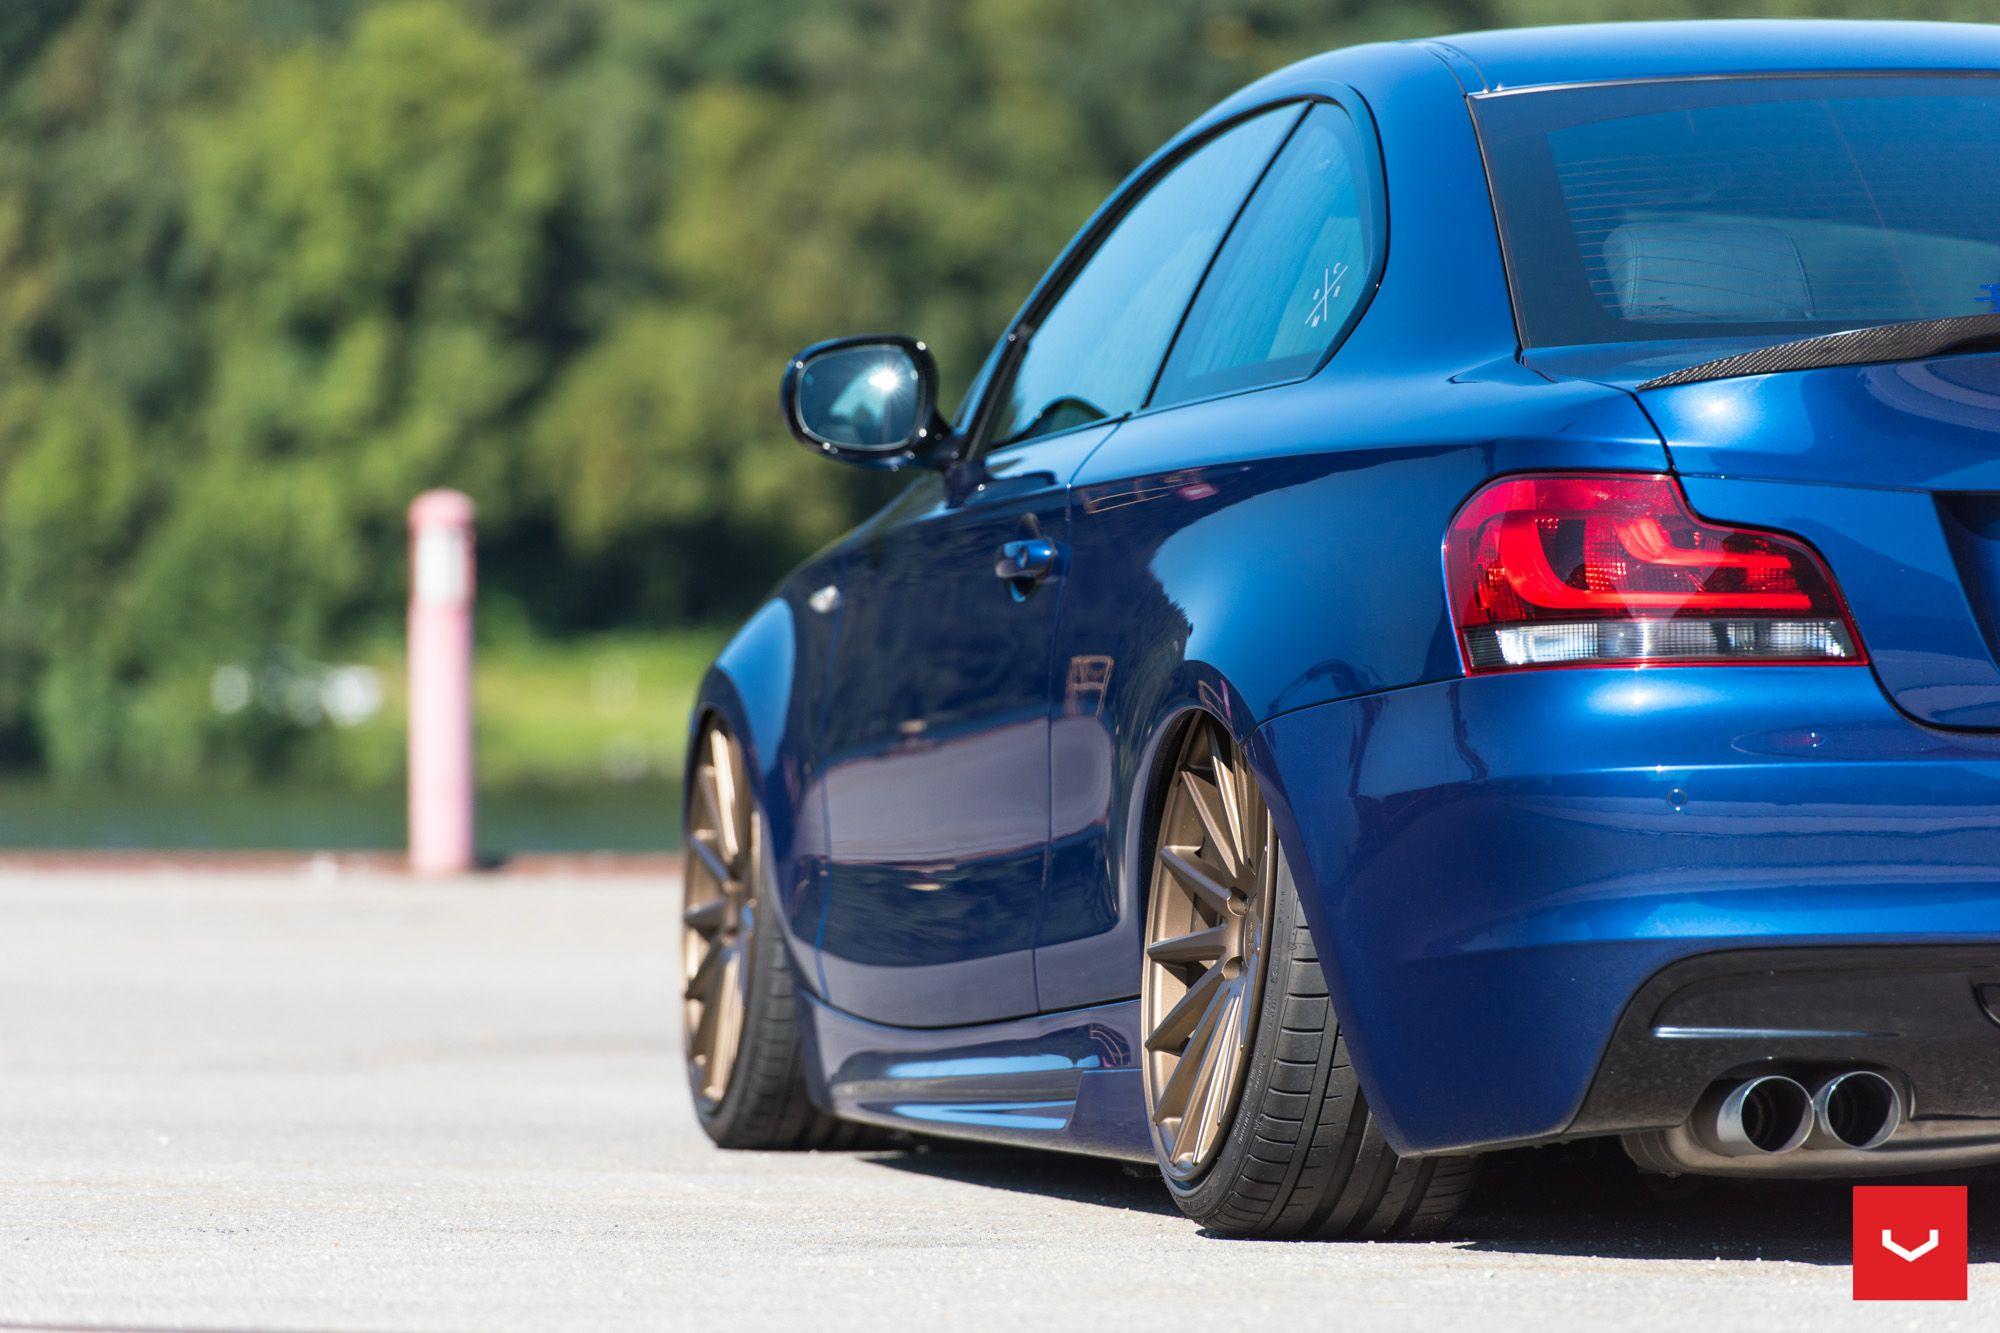 BMW E I Coupe MPackage VOSSENWheels Provocative Eyes - Bmw 135i tune